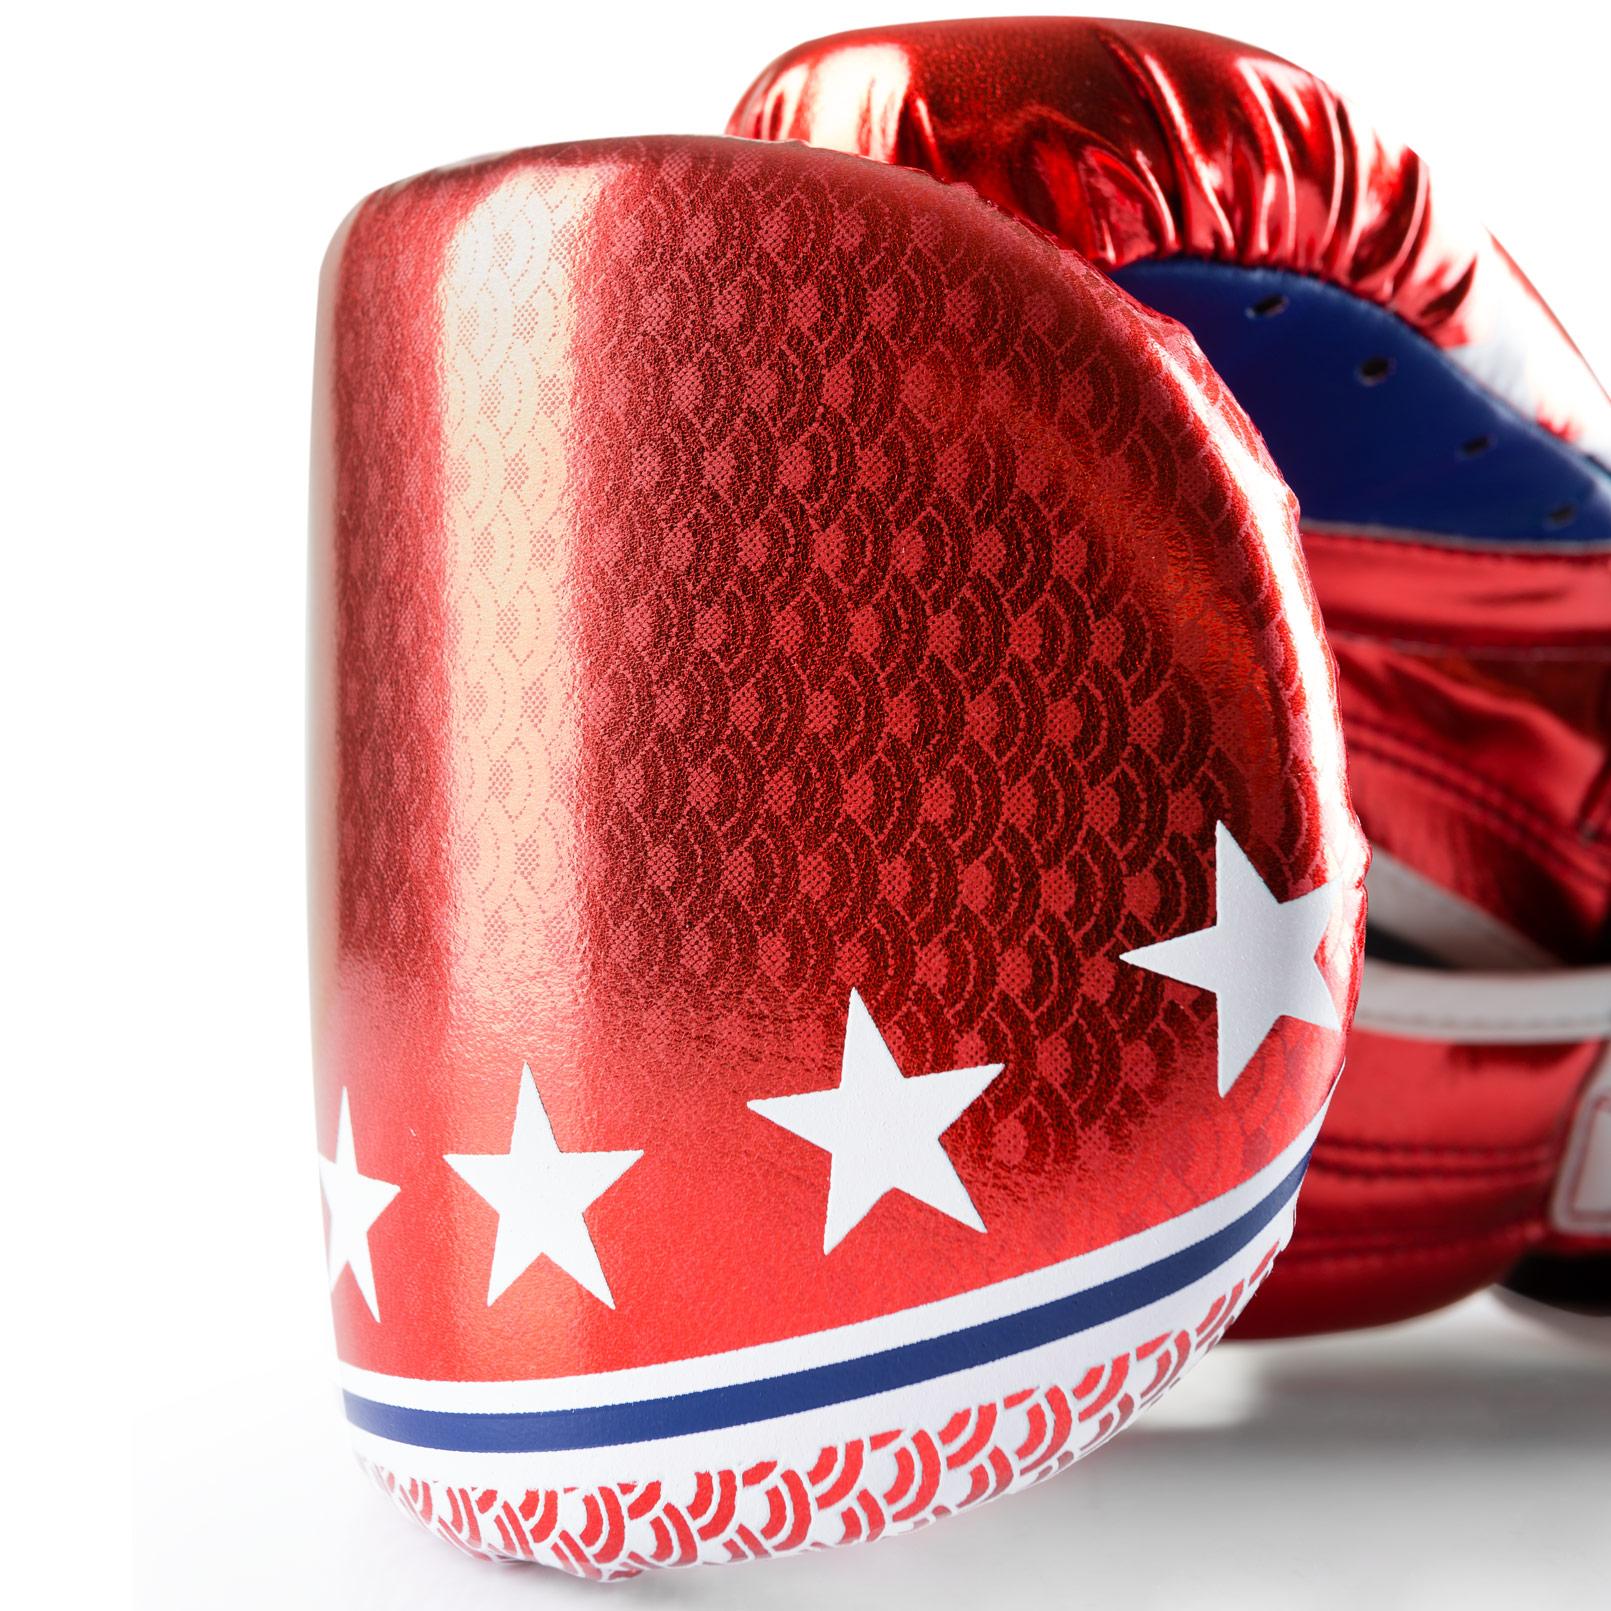 Muay Thai Gloves - texture - red